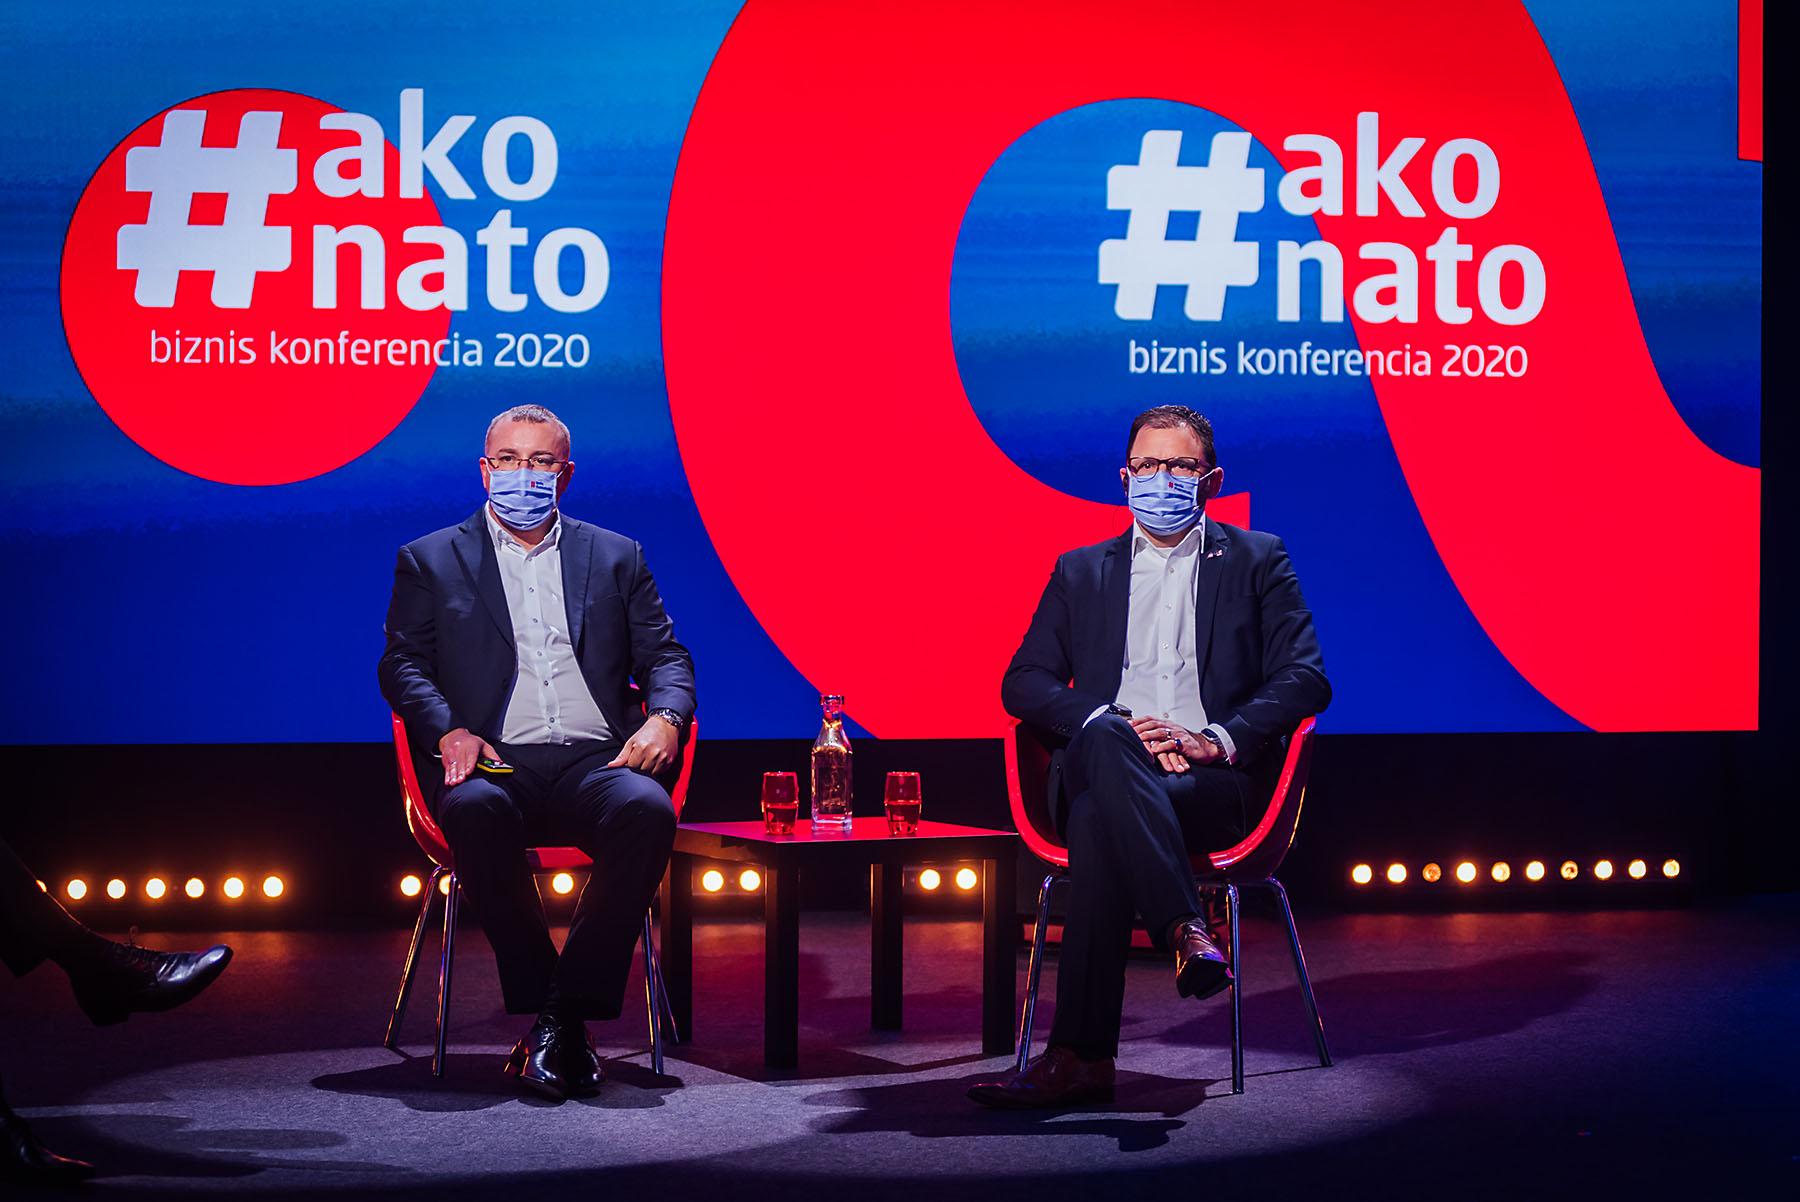 Biznis konferencia #akonato 2020 -  - eventovy fotograf